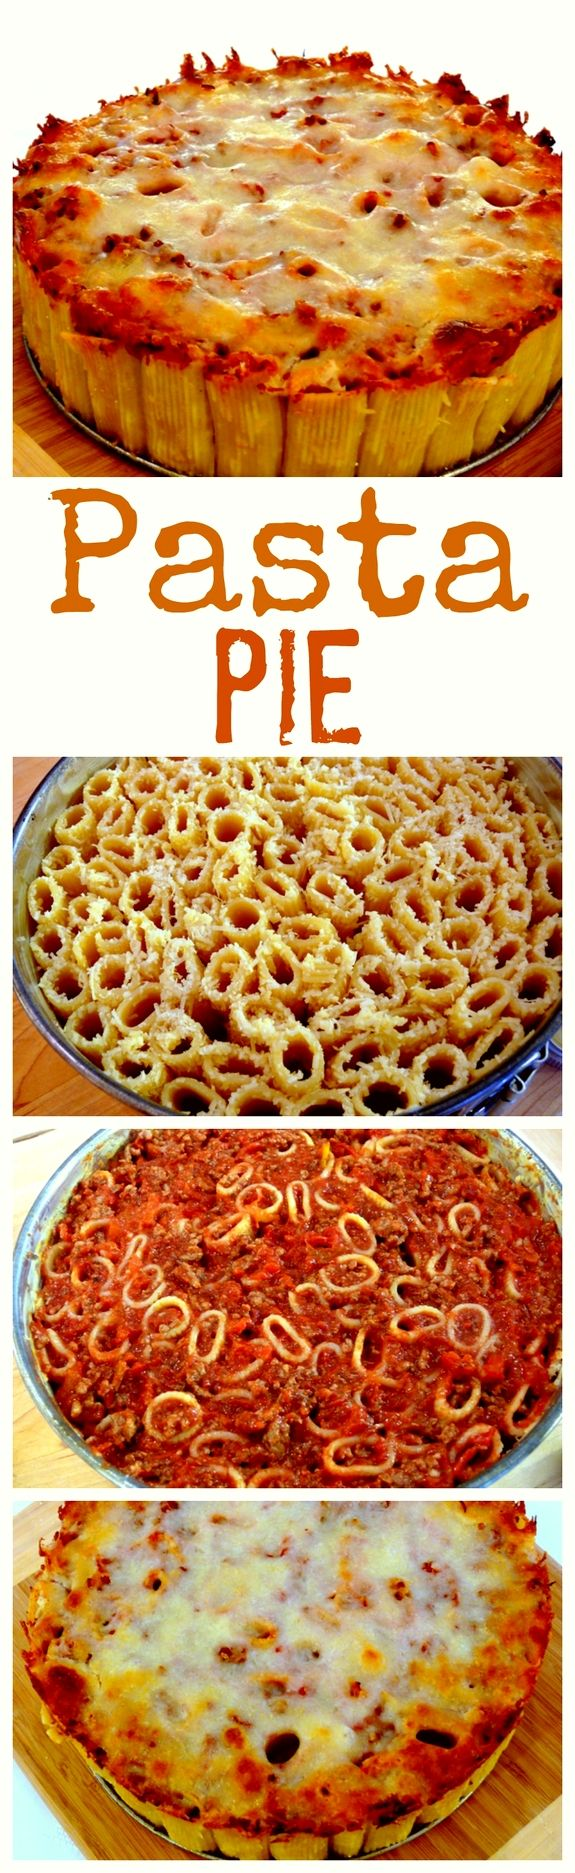 VIDEO + Recipe for Pasta Pie from NoblePig.com.